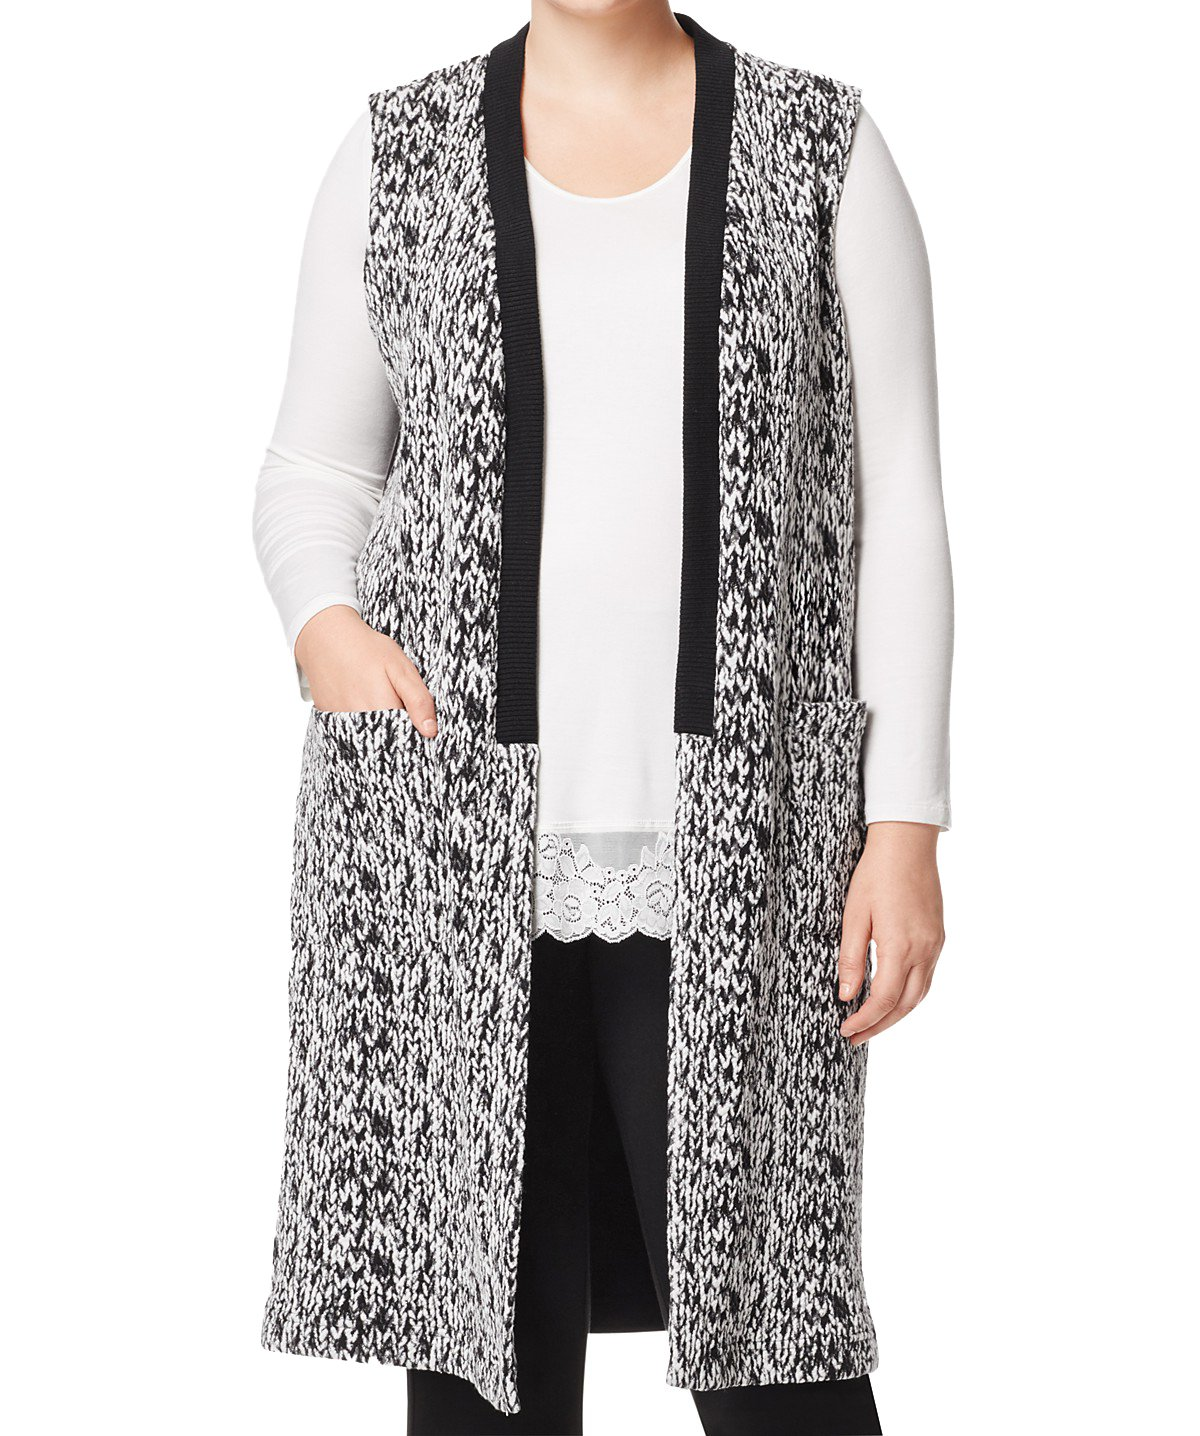 Marina Rinaldi Women's Olifante Sweater Vest, Black/White, Large